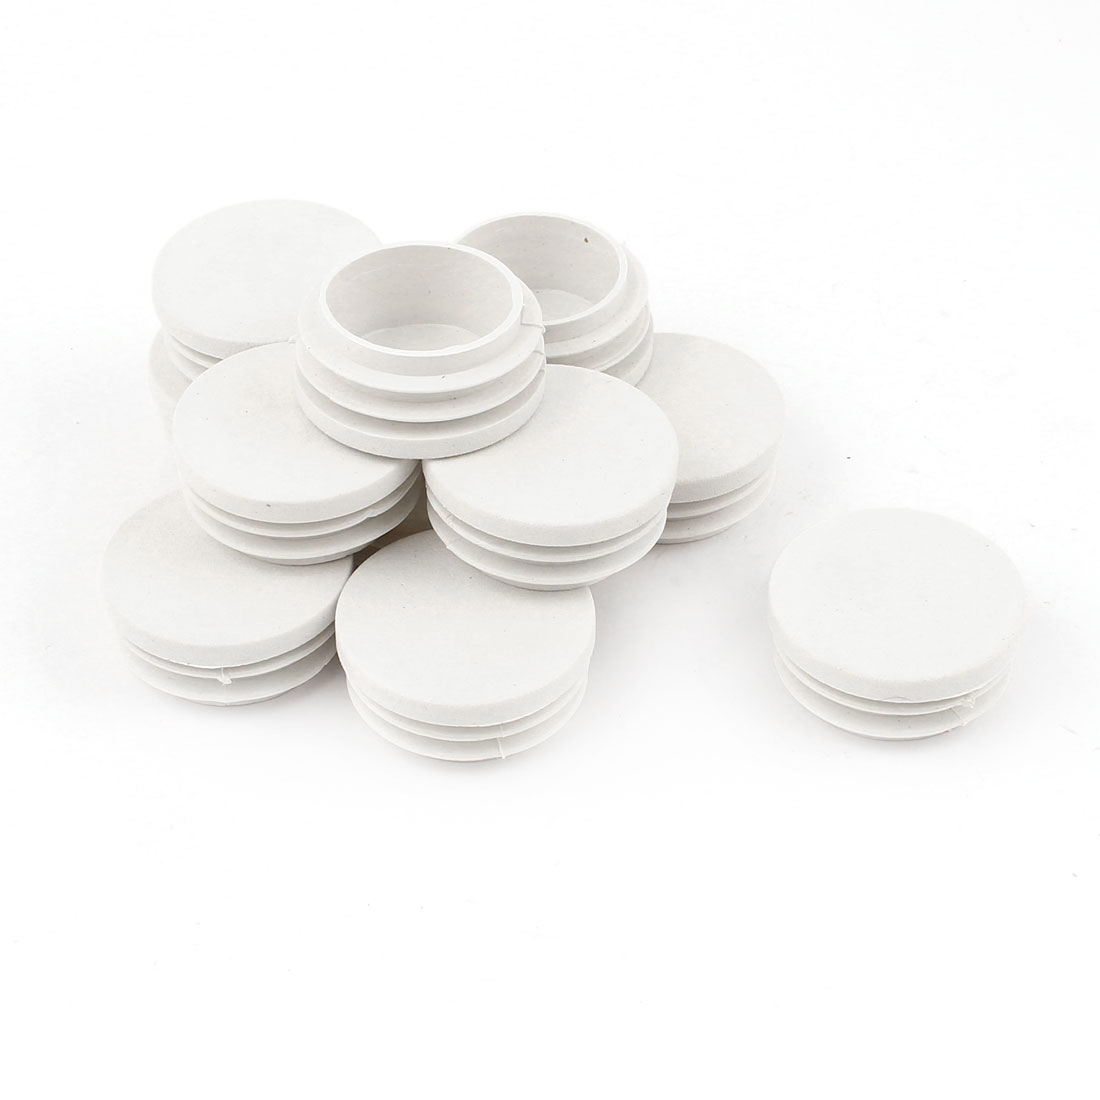 Plastic Round Tubing Tube Insert Caps Covers White 37mm Thread Diameter 12 Pcs